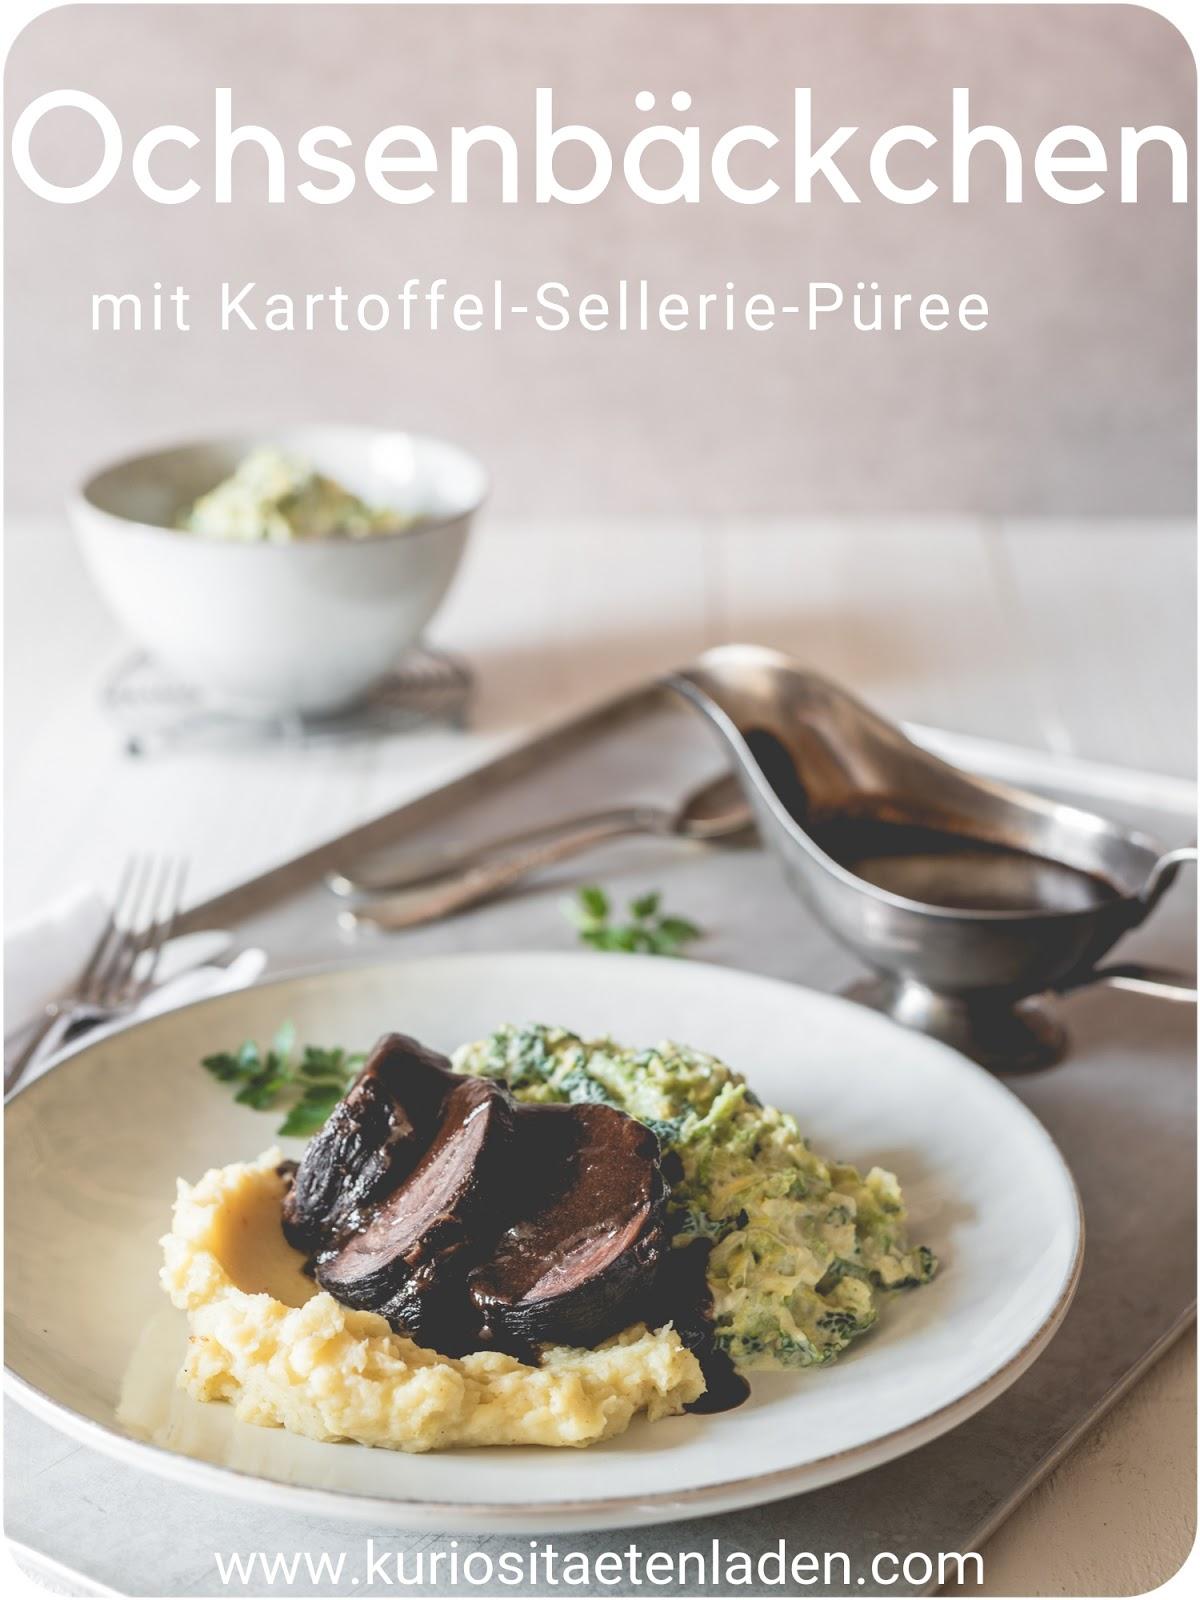 Geschmorte Ochsenbäckchen mit Kartoffel-Sellerie-Püree